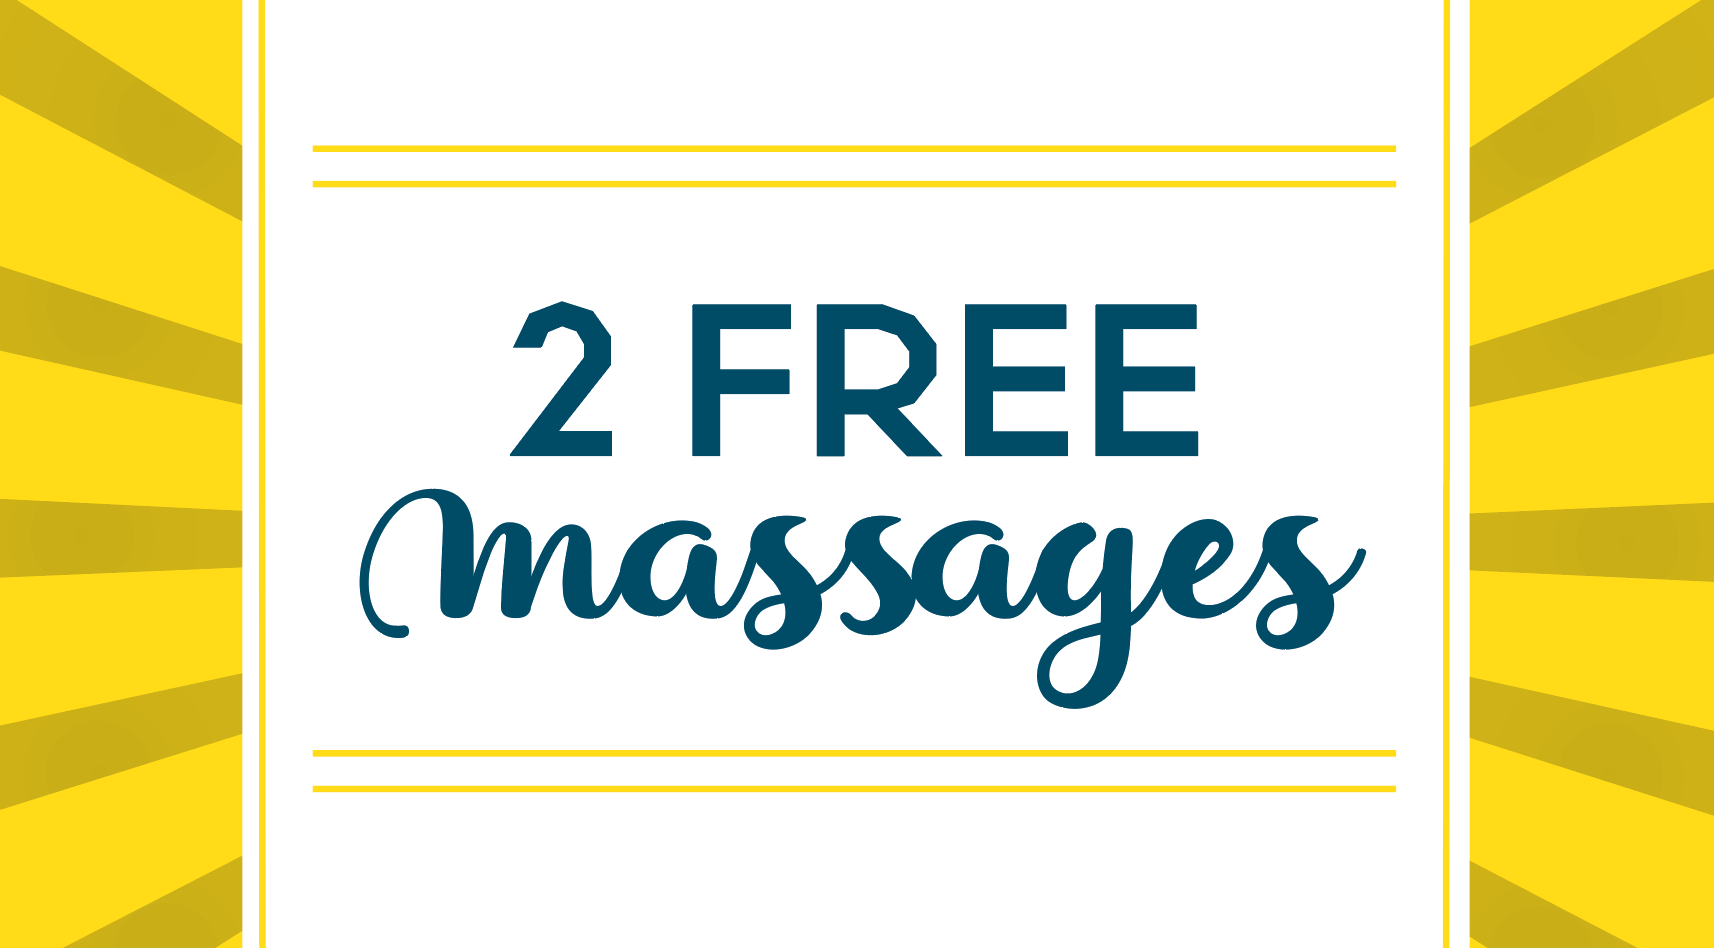 2 Free Massages